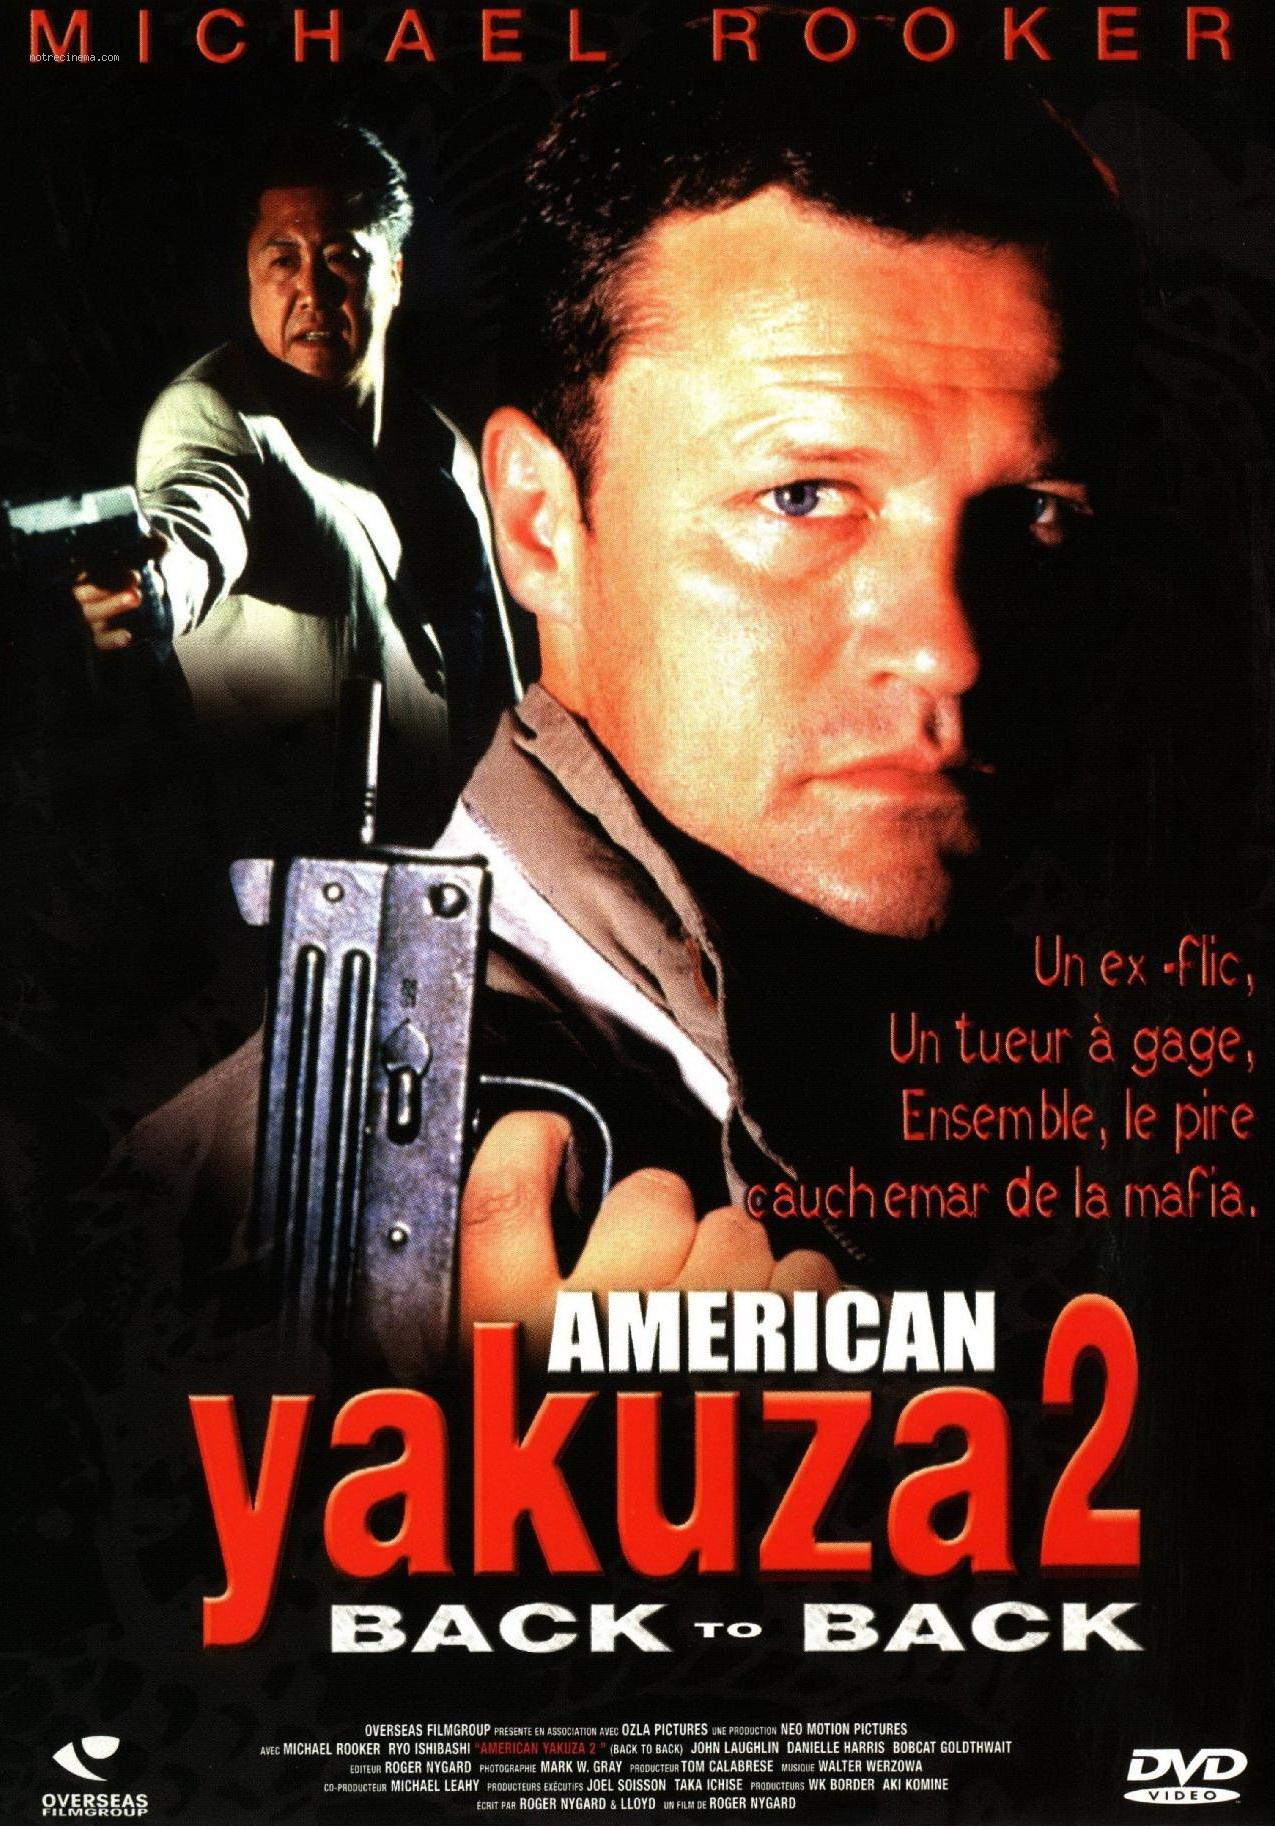 affiche du film American Yakuza 2